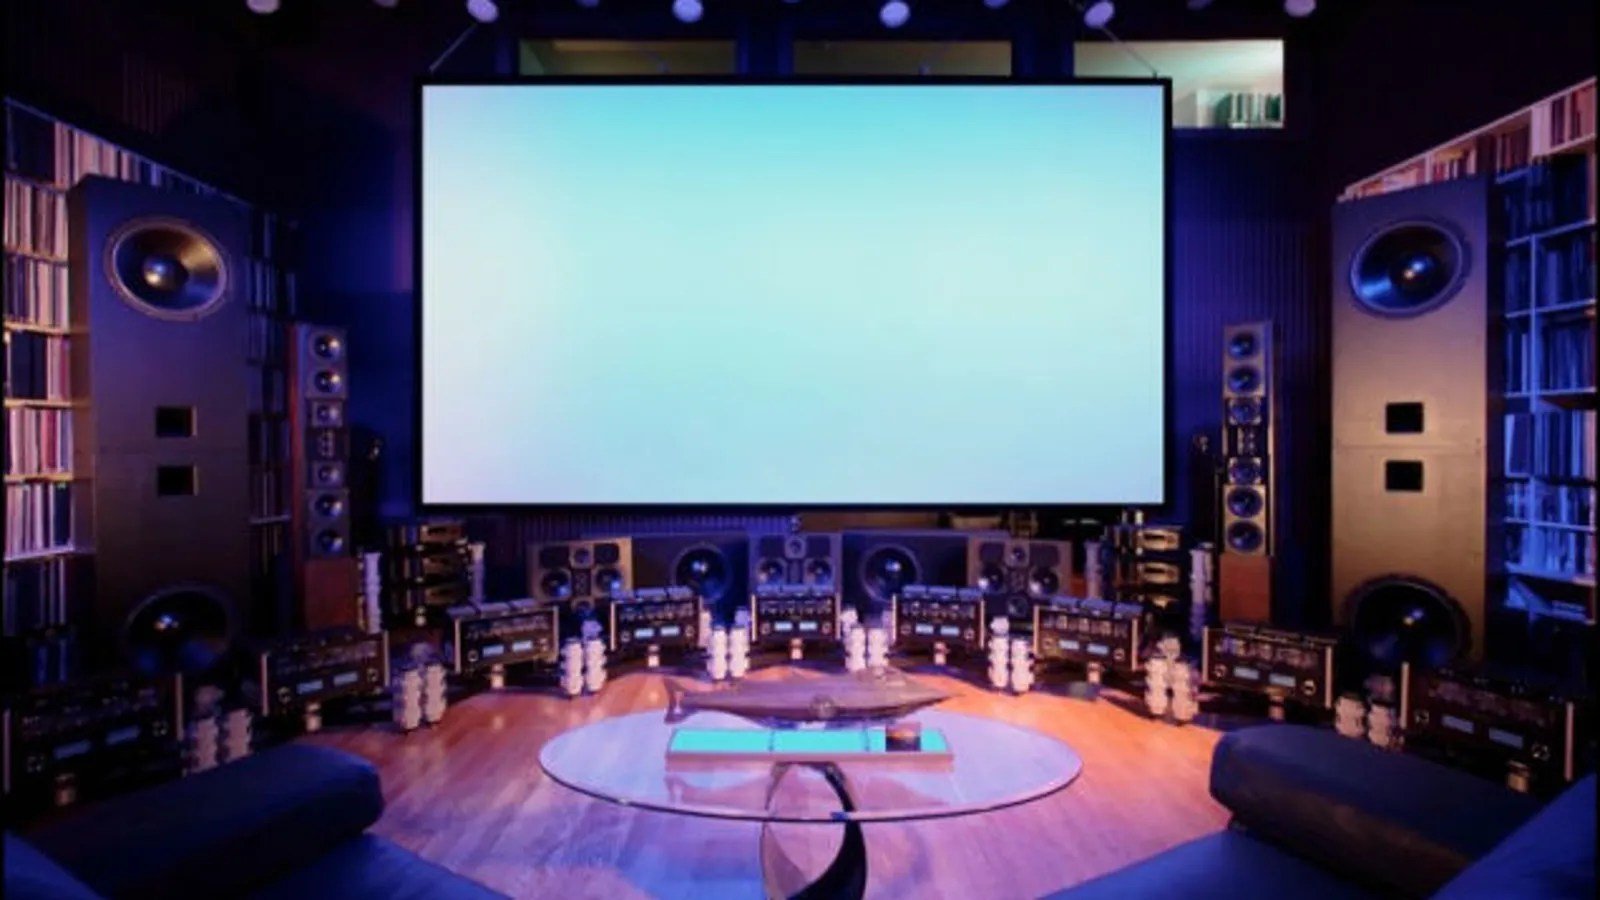 Dolbys Crazy Atmos Surround Sound Comes to Your Living